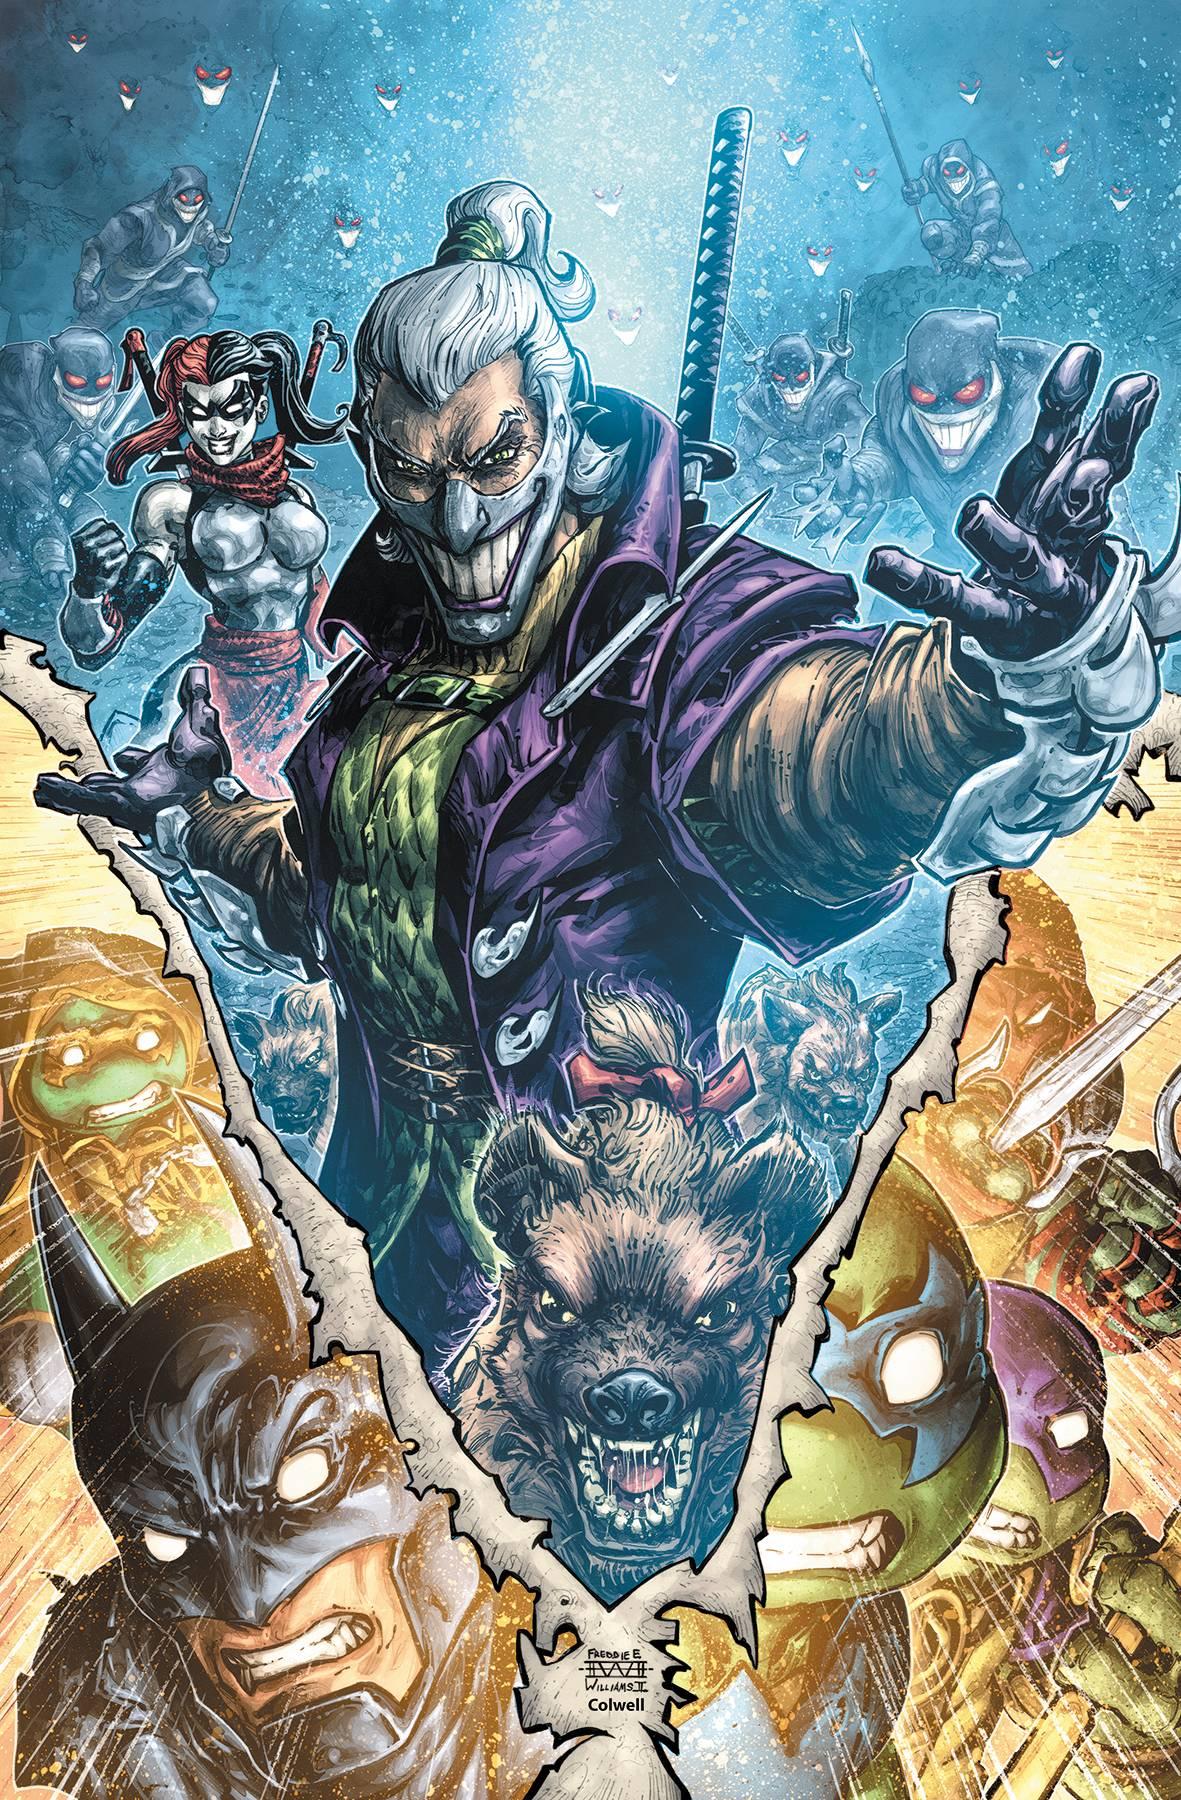 BATMAN TEENAGE MUTANT NINJA TURTLES III #4 (OF 6)